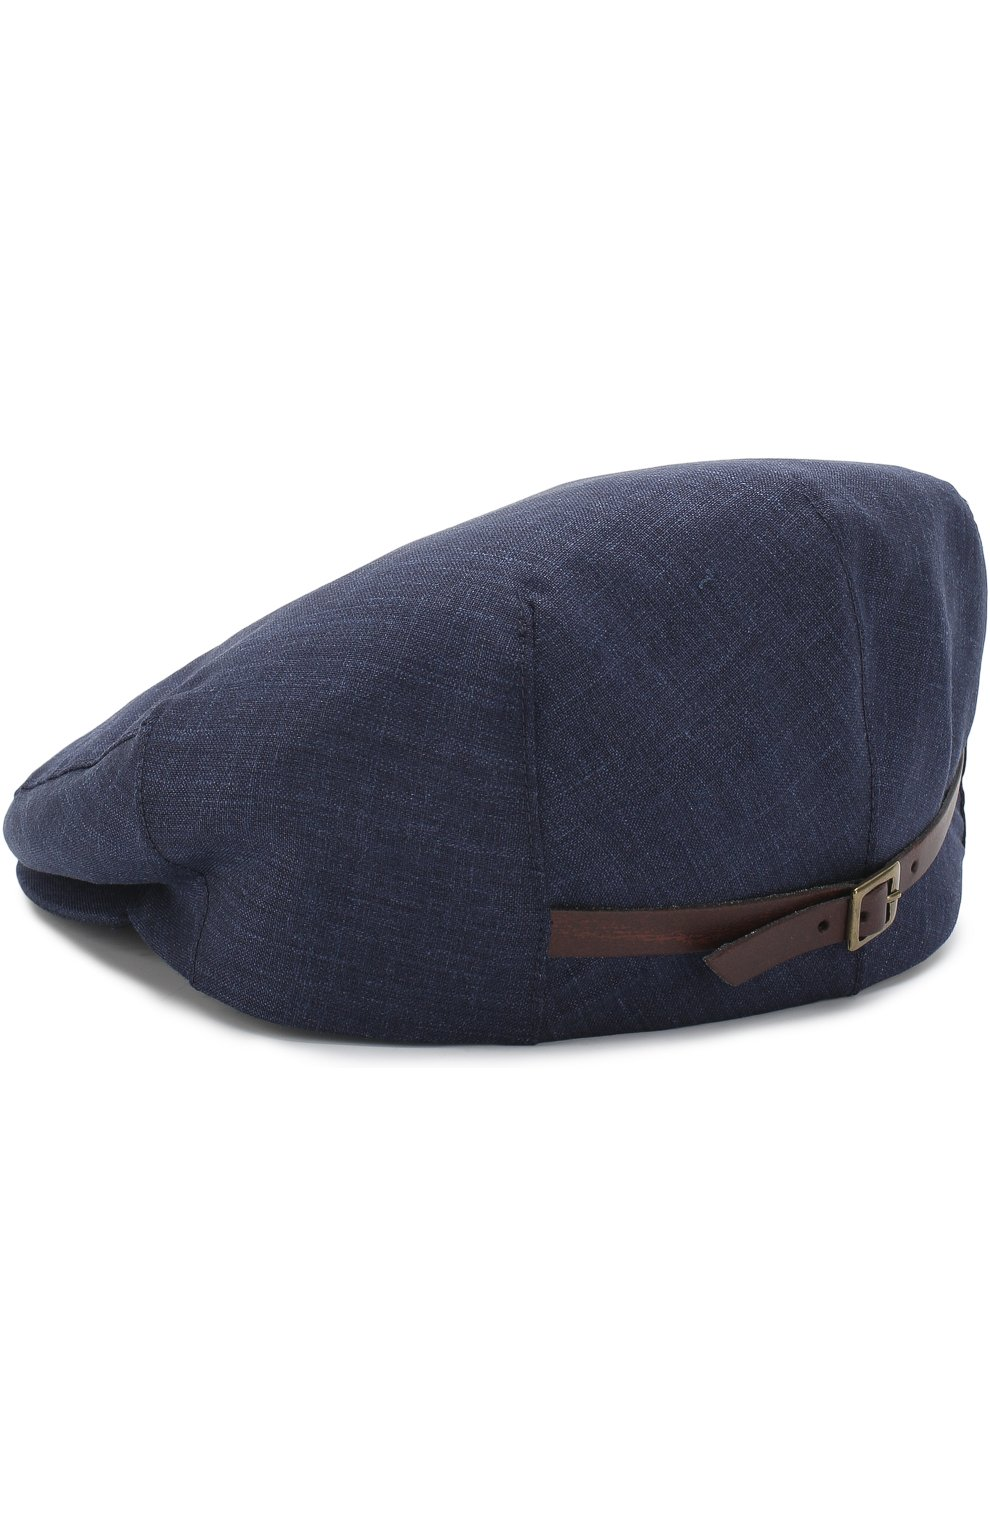 Мужская кепи из смеси шерсти и шелка со льном LUCIANO BARBERA темно-синего цвета, арт. 128001/46079 | Фото 2